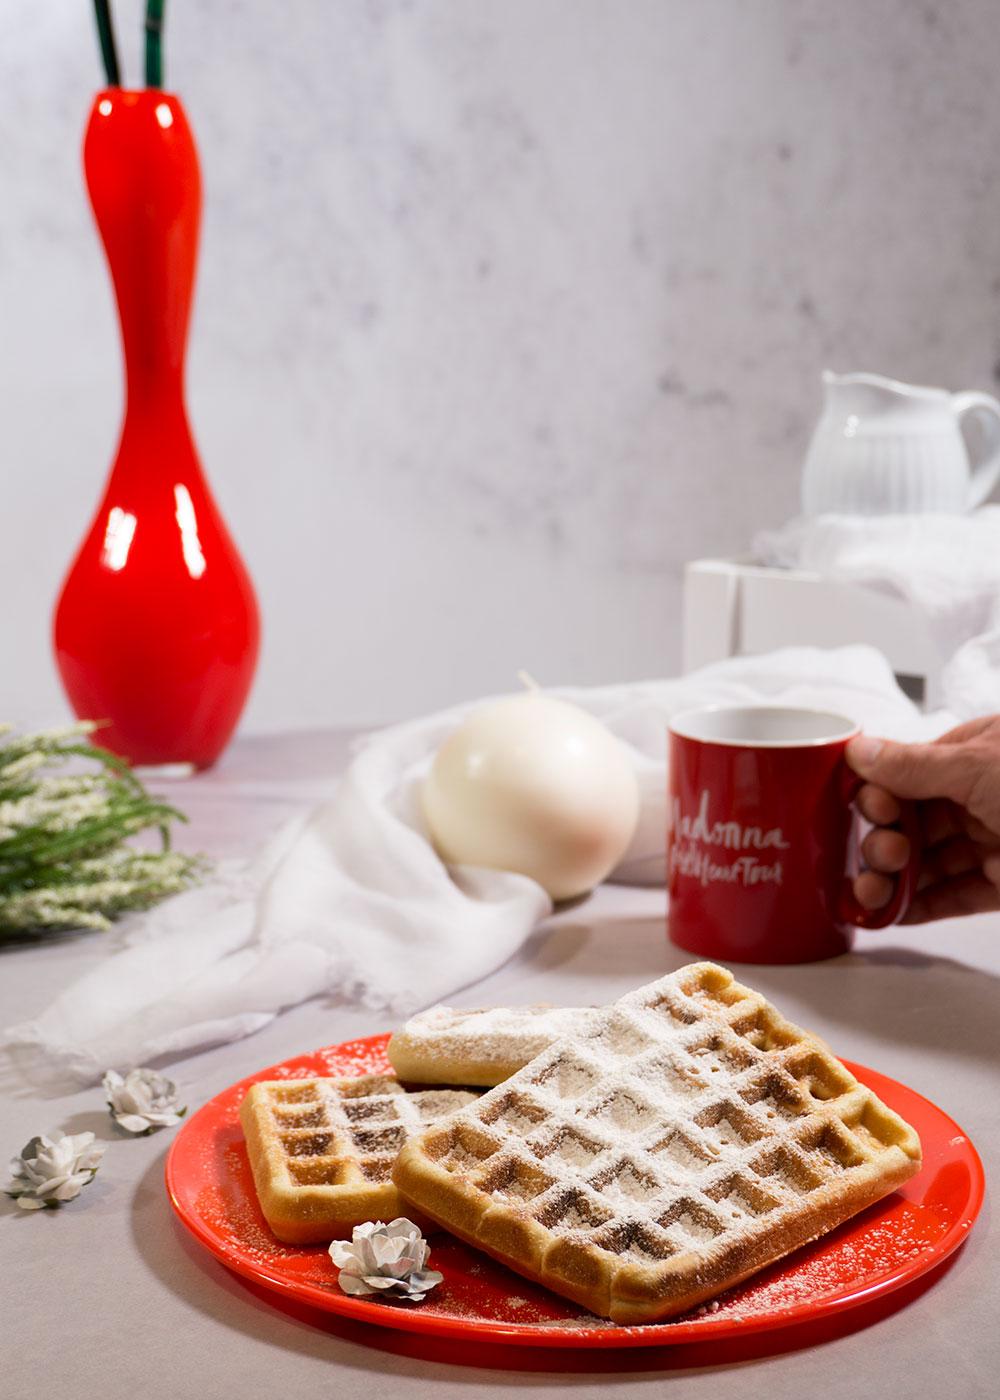 receta postre gofre belga para san valentín cena 14 de febrero